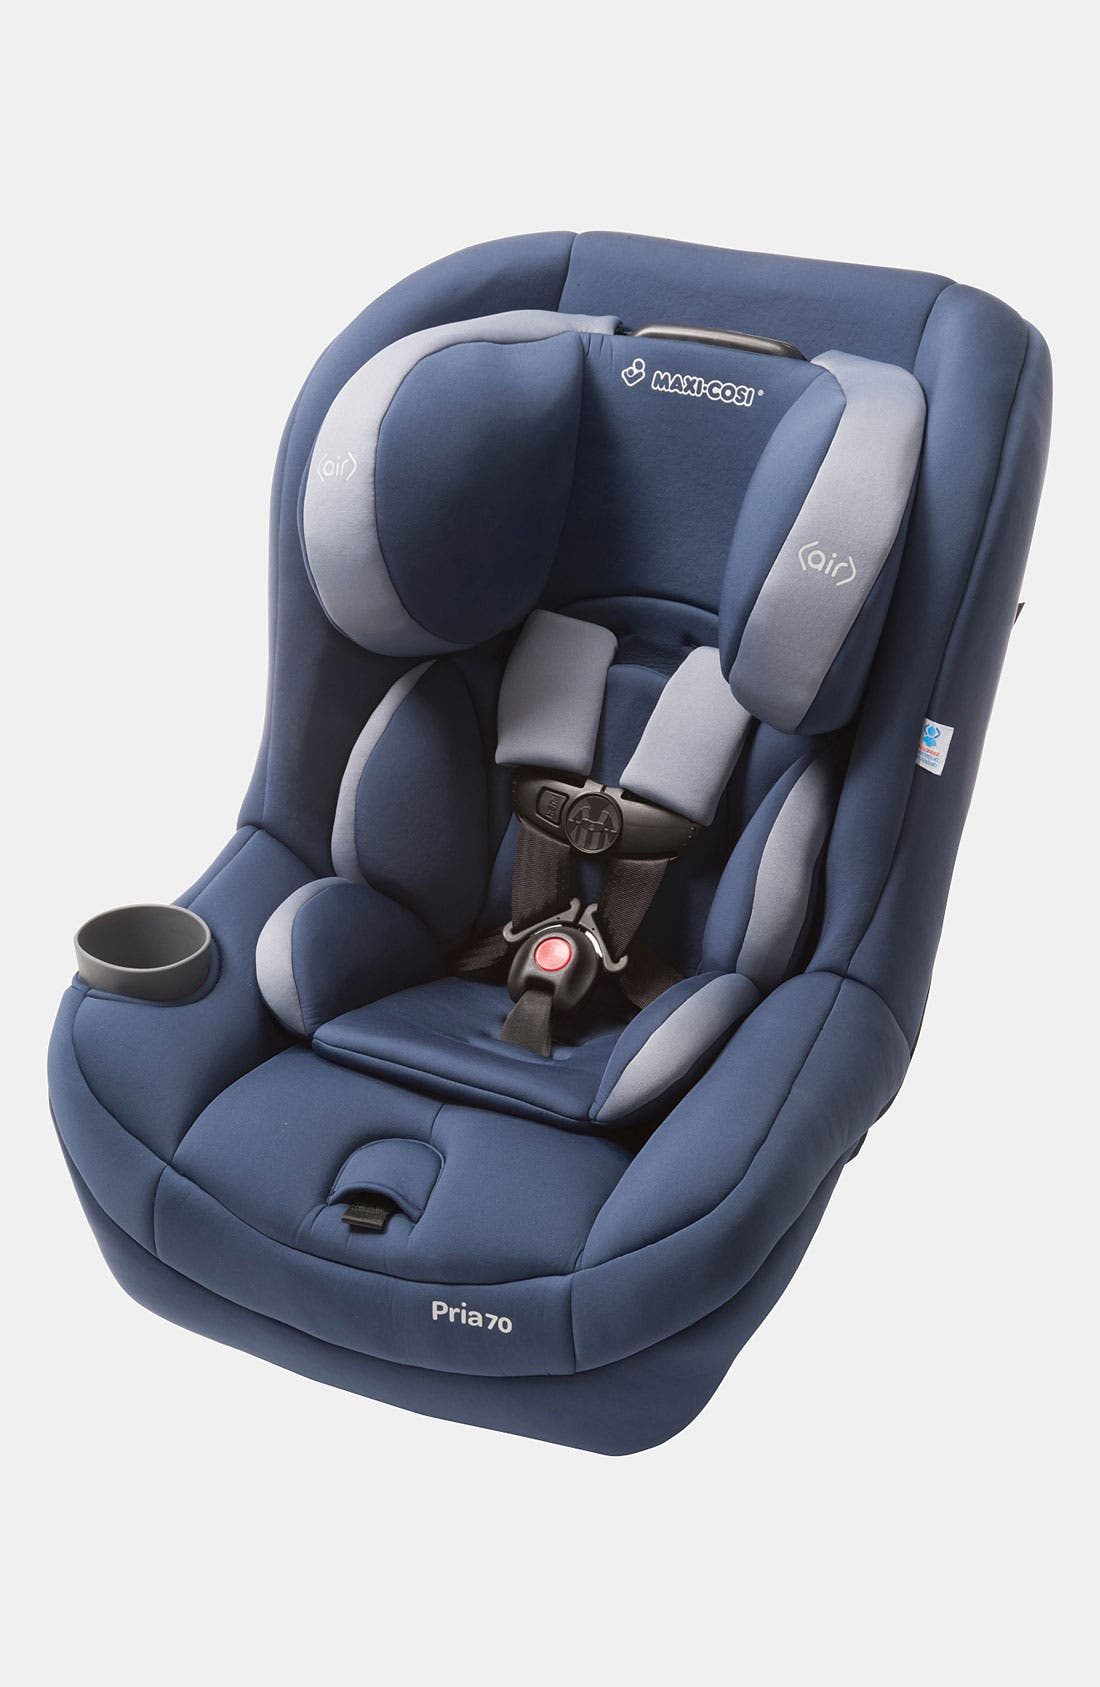 Alternate Image 1 Selected - Maxi-Cosi® 'Pria™ 70' Car Seat (Baby & Toddler)